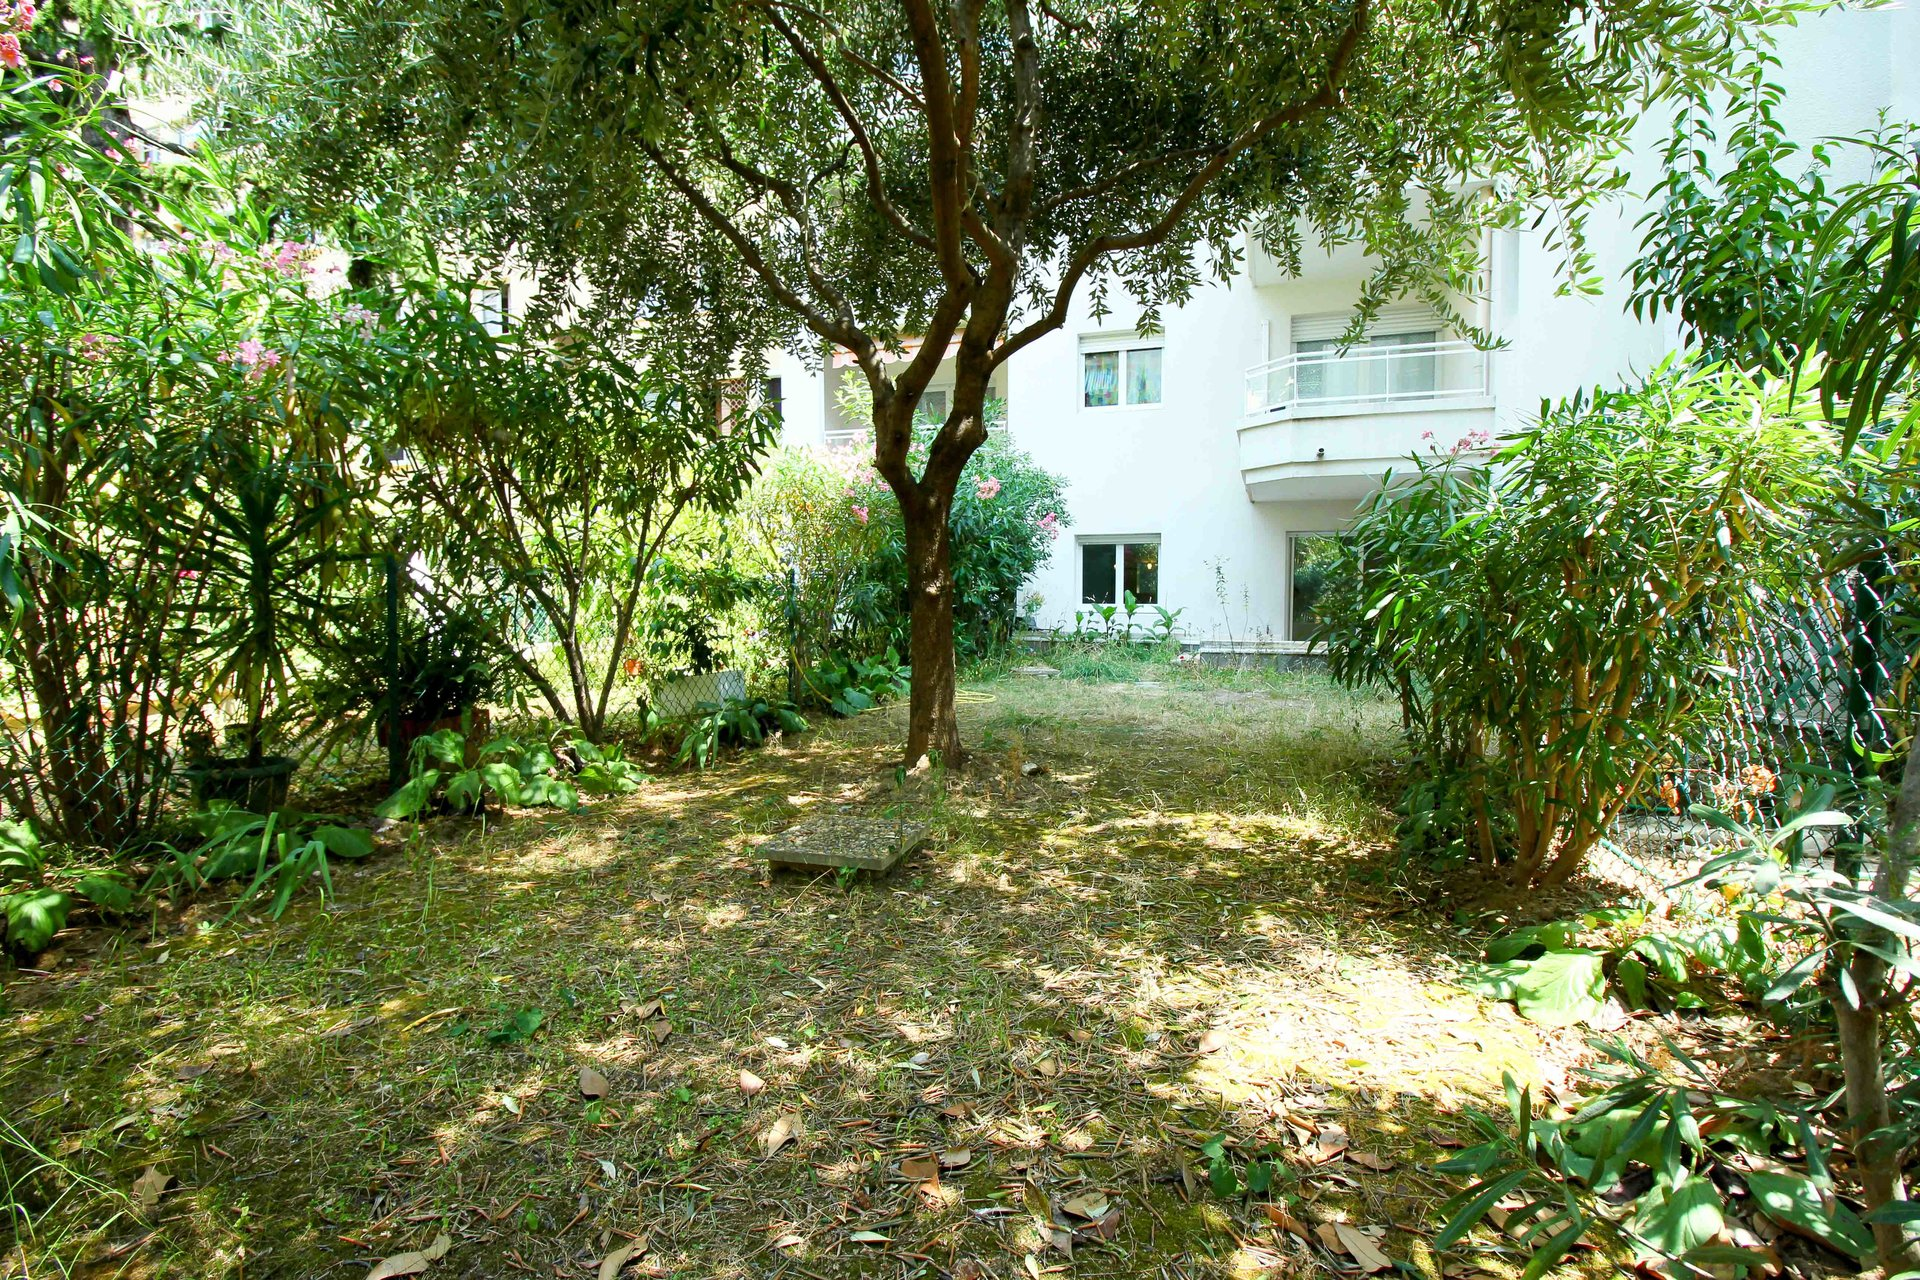 NICE - GORBELLA - Location 2 Pièces vide avec jardin